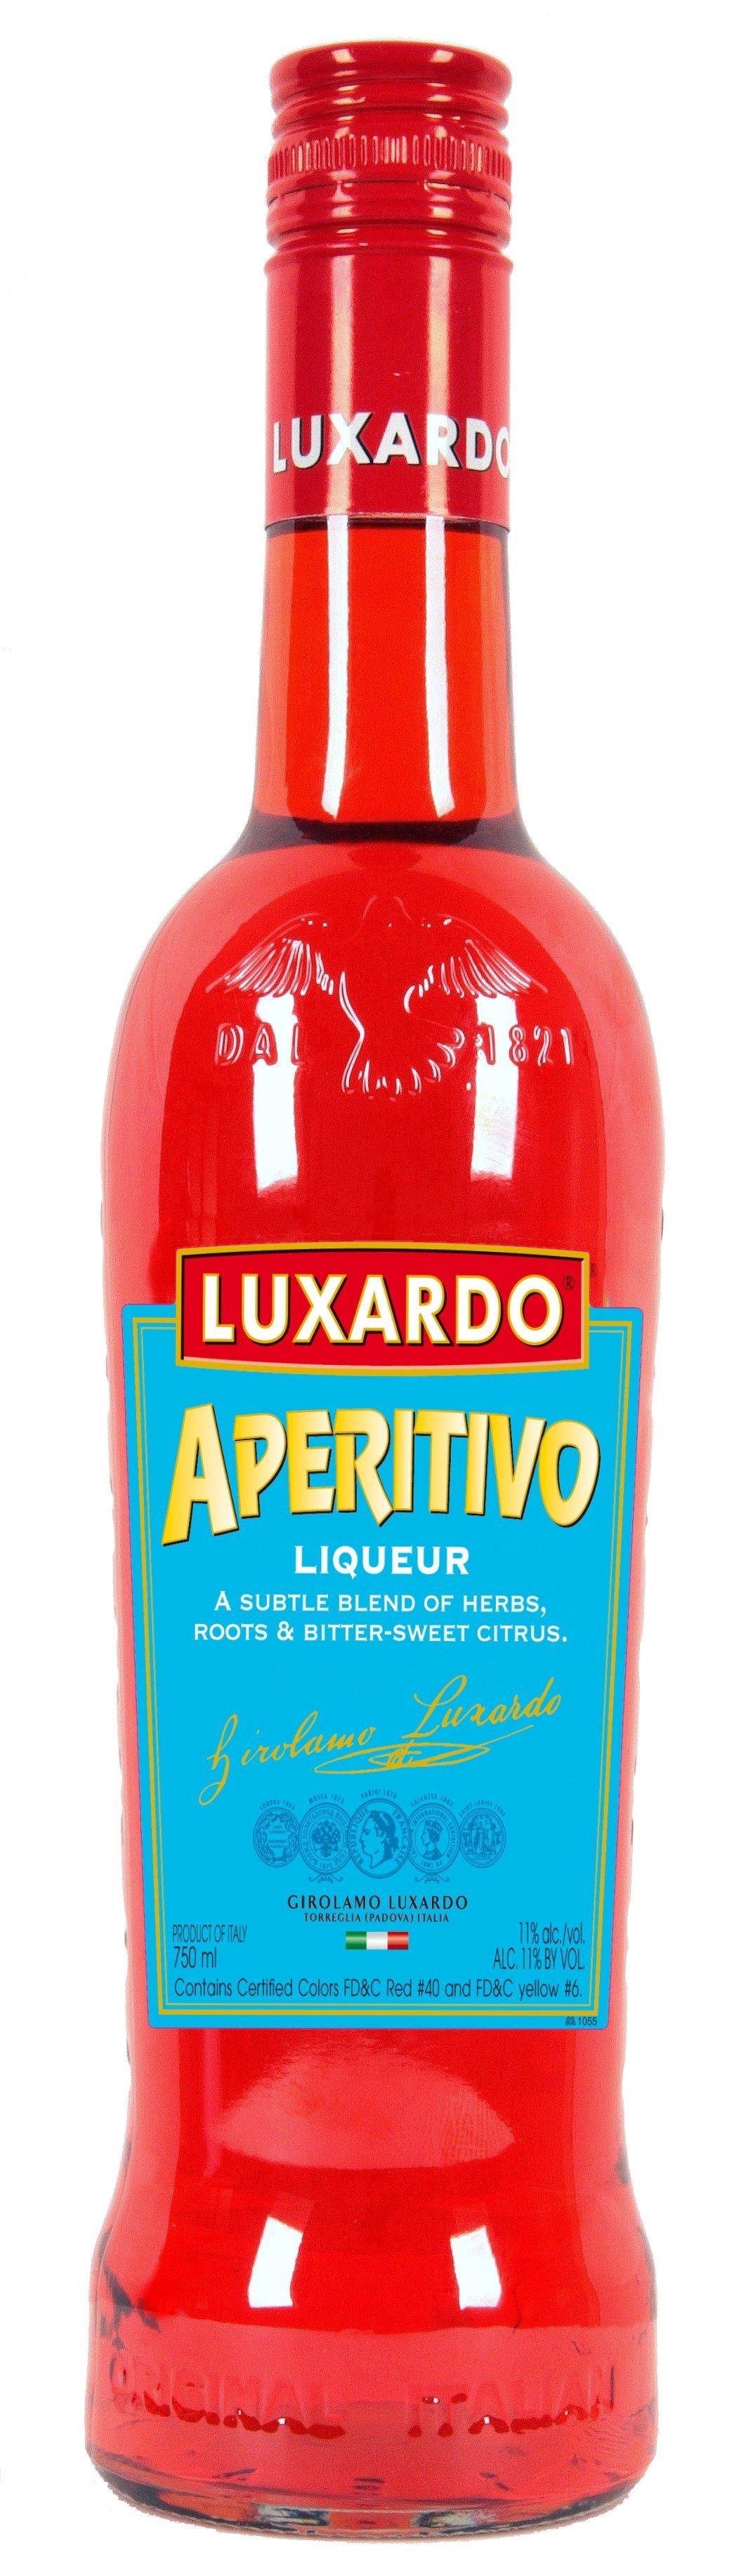 Luxardo Aperitivo Liqueur